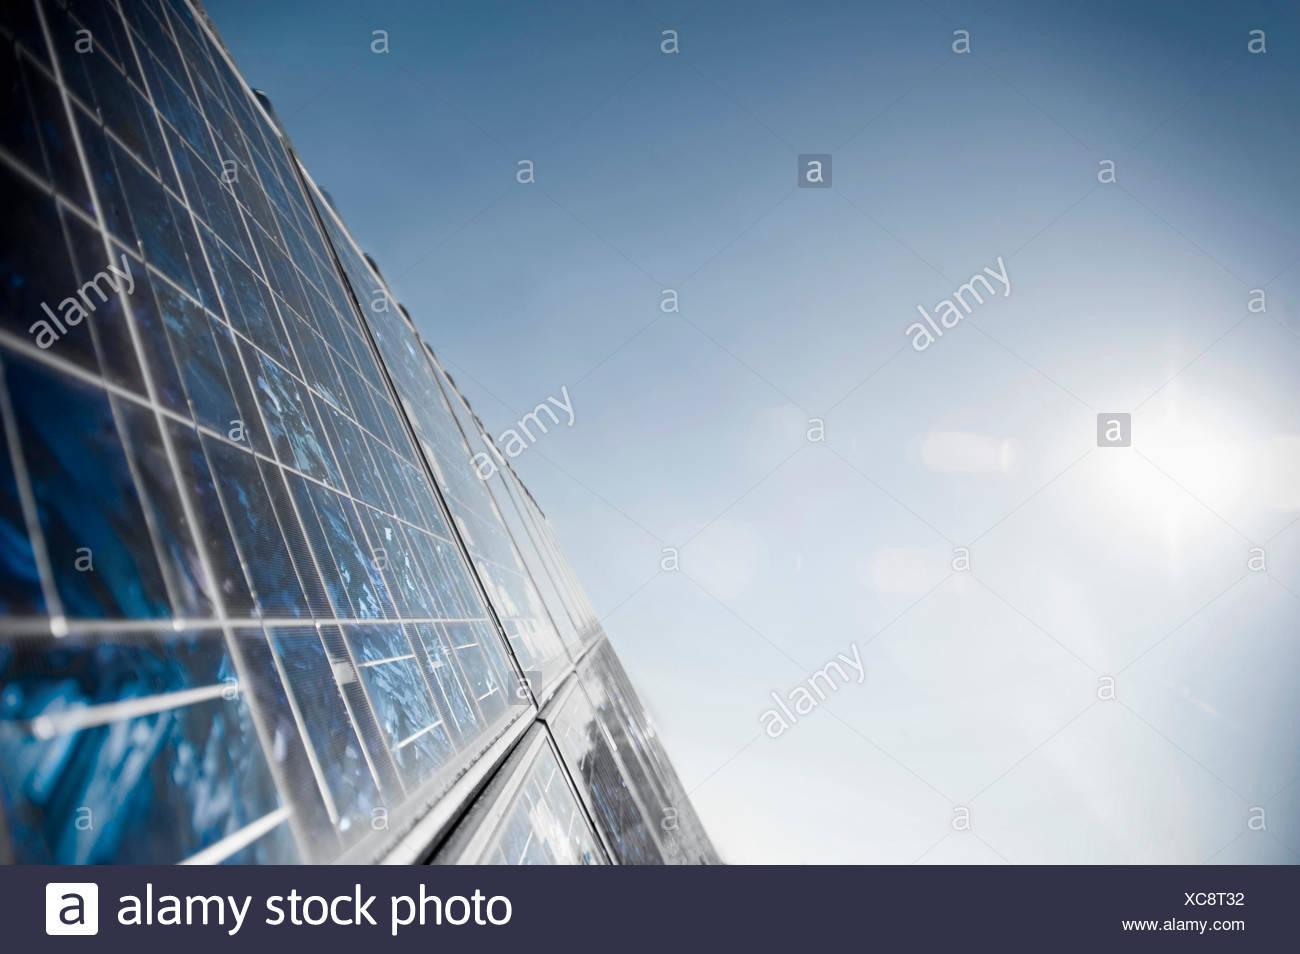 Solar panels, Bavaria, Germany - Stock Image